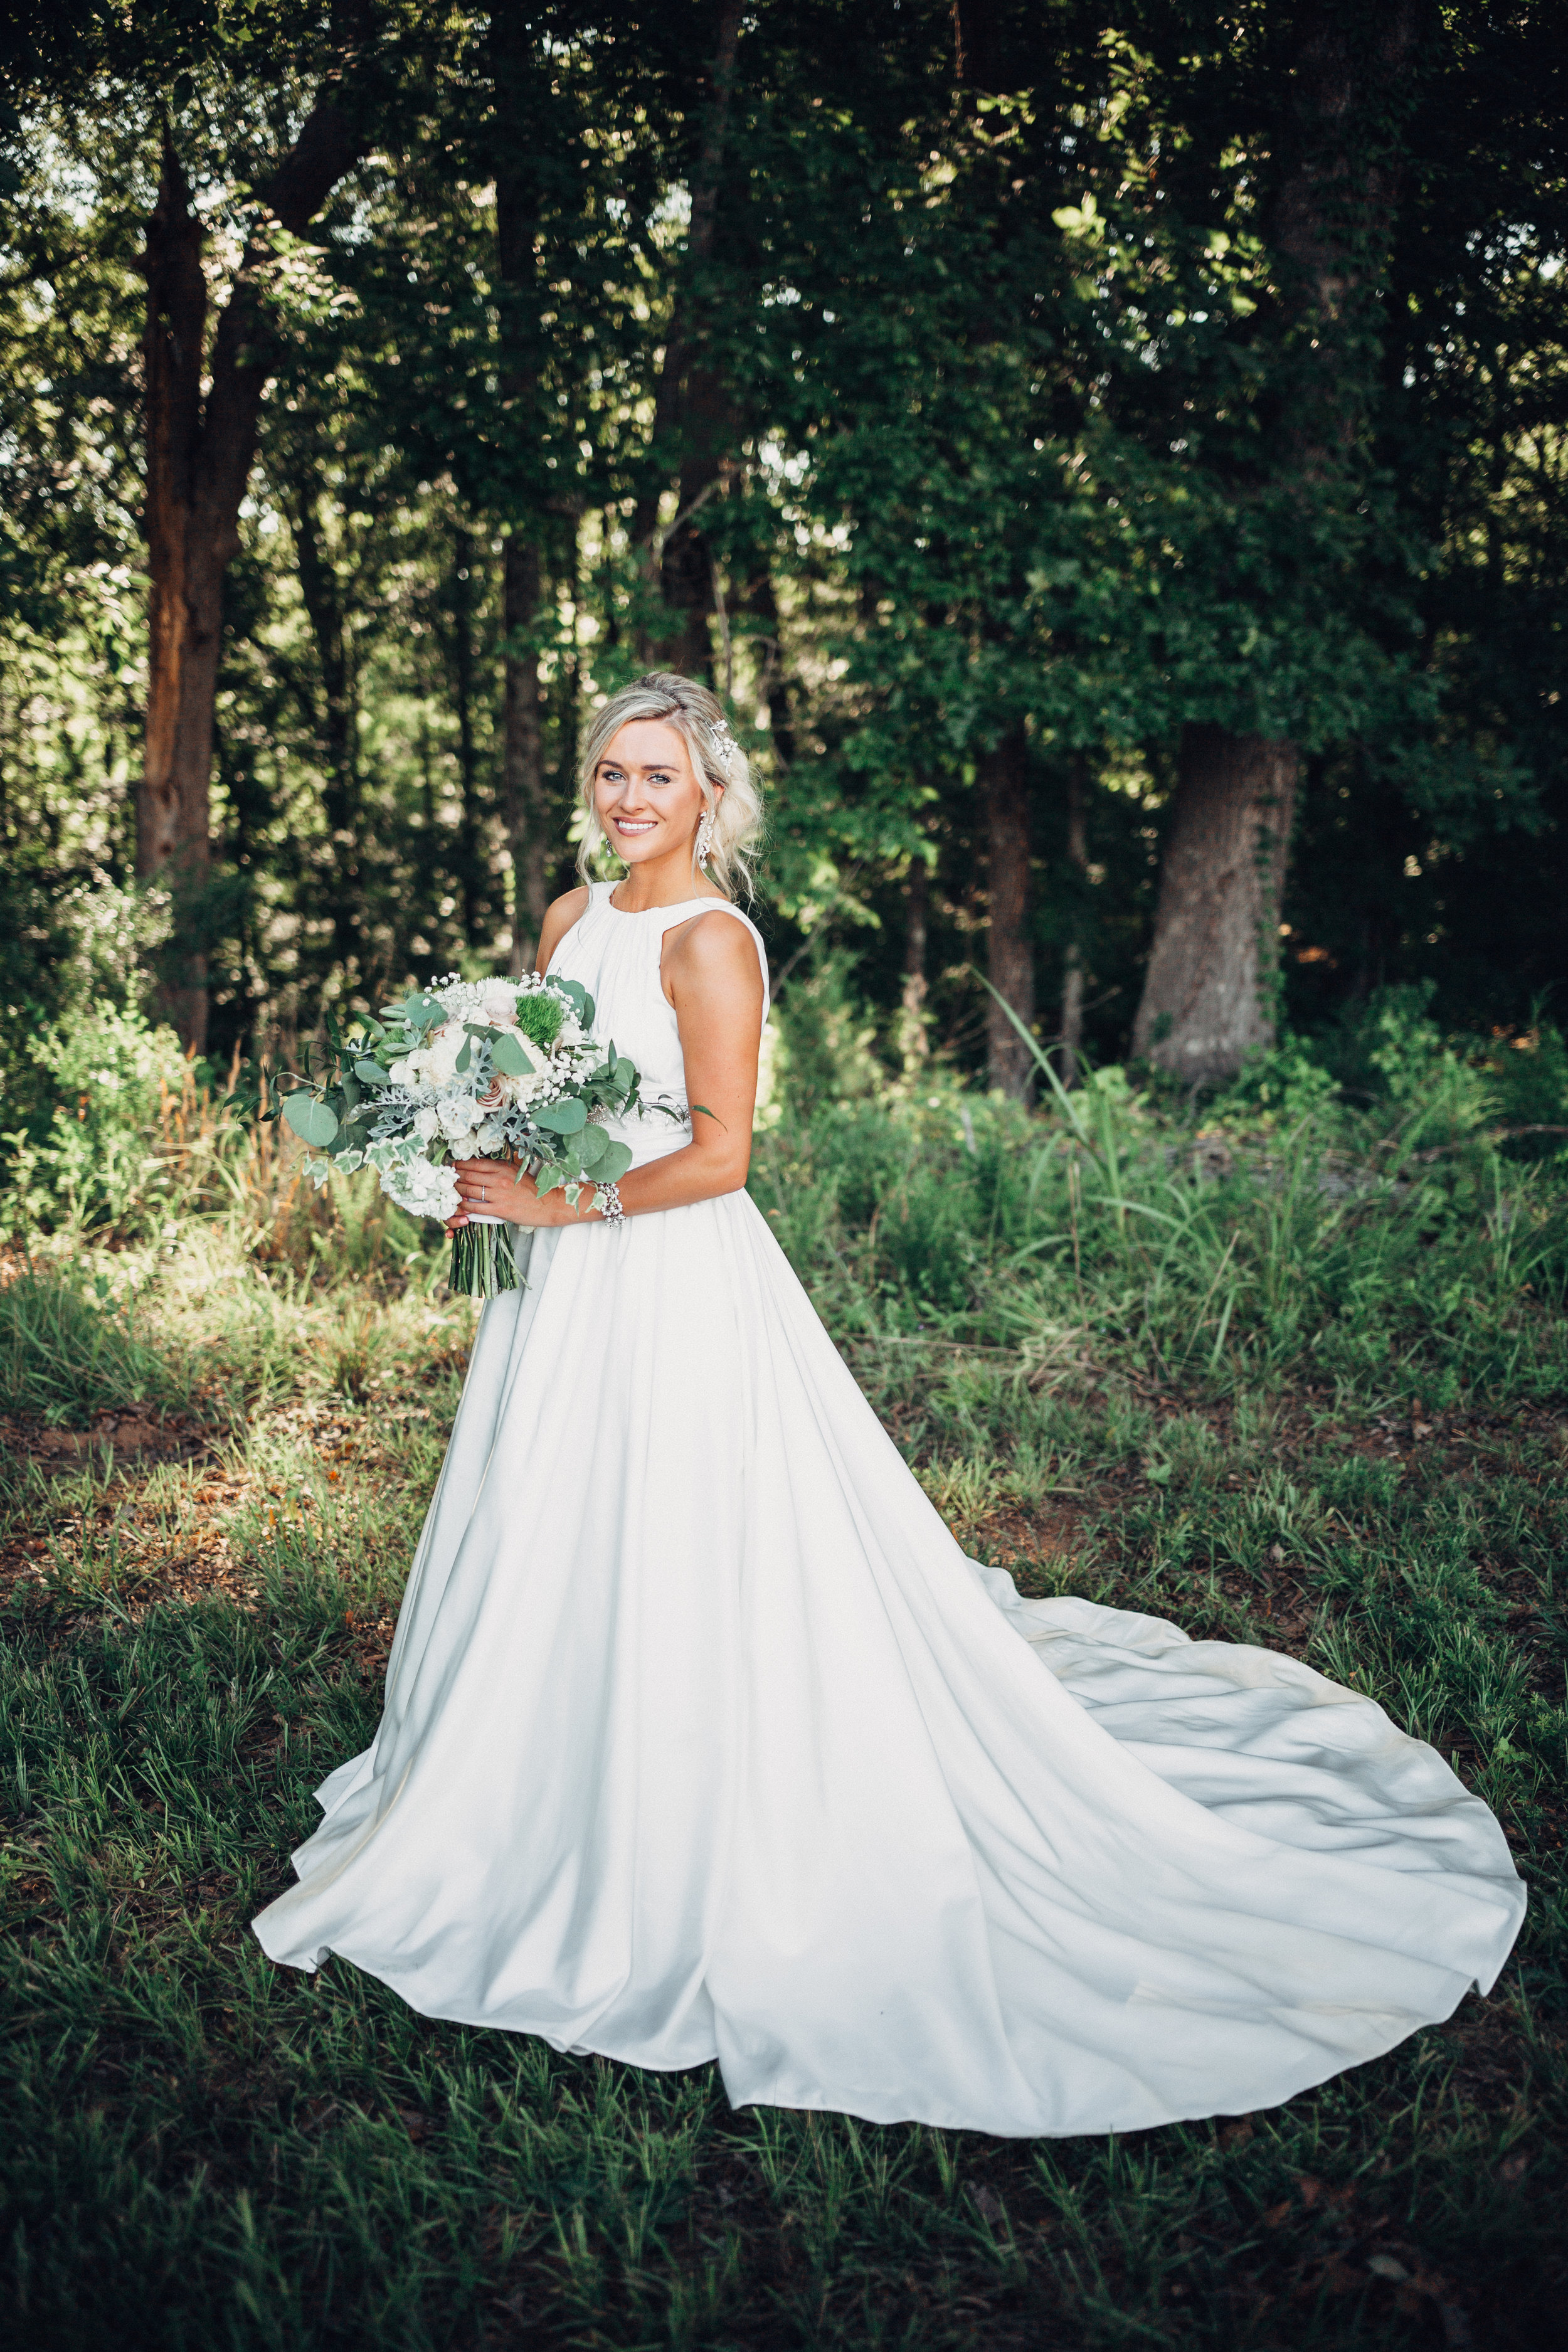 Cox_Portraits_Bridal_Retouched-3.jpg